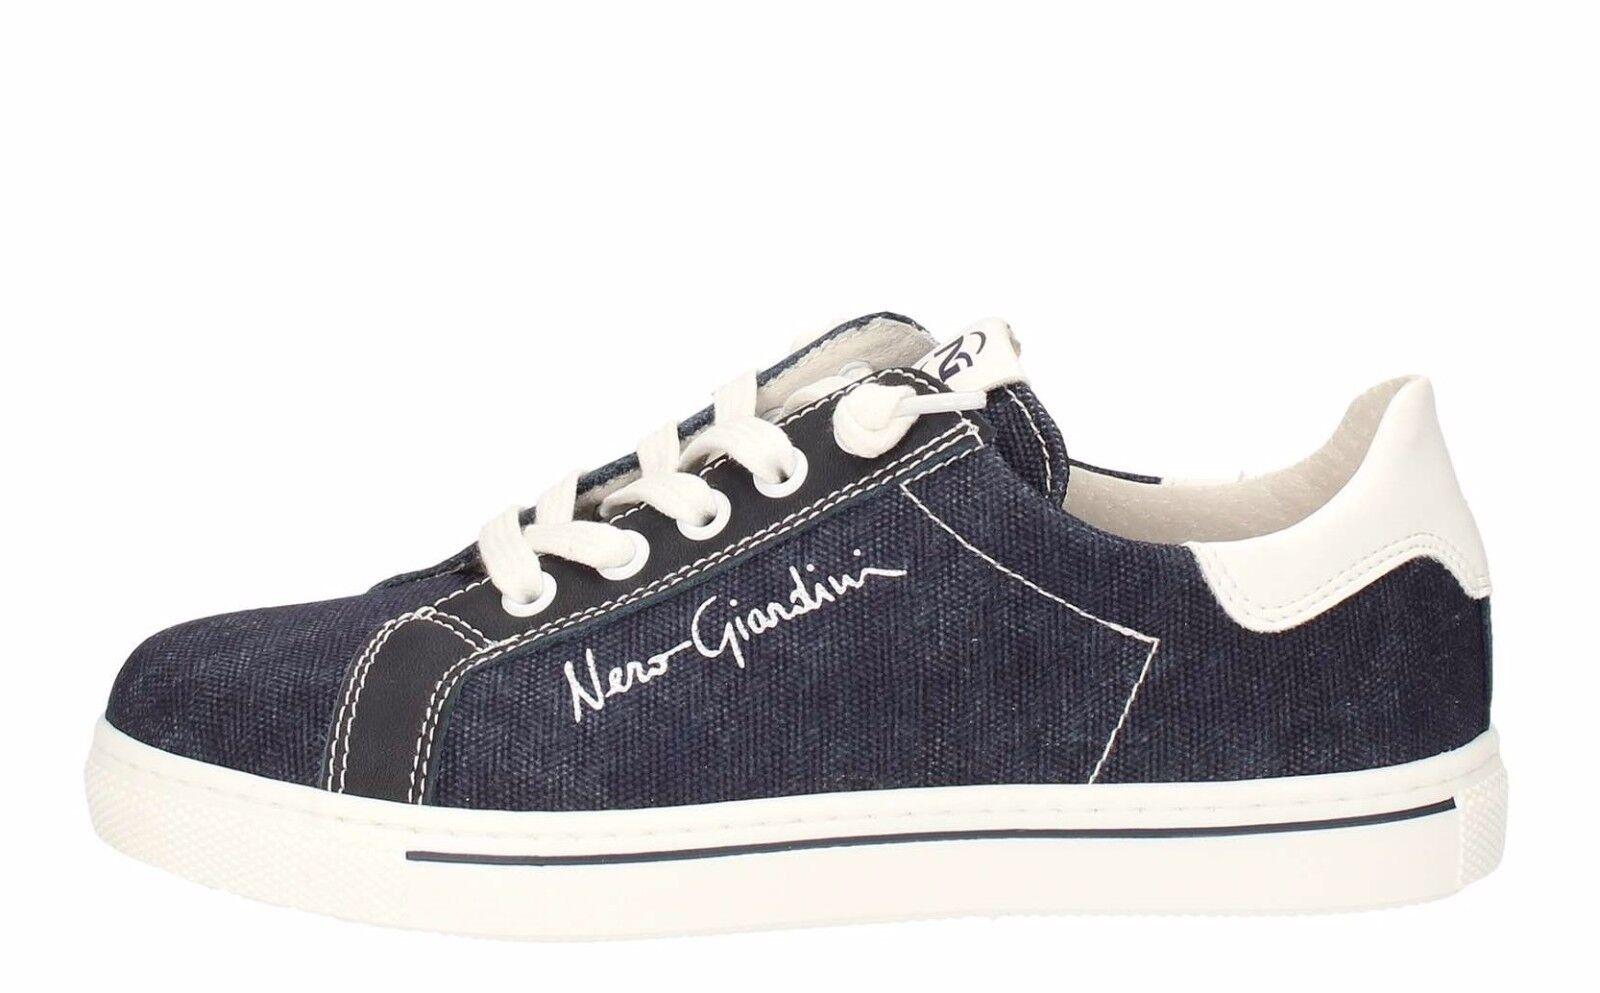 NERO GIARDINI jeans P734131M TEEN scarpe donna scarpe da ginnastica jeans GIARDINI pelle tessuto stringhe d16cc1